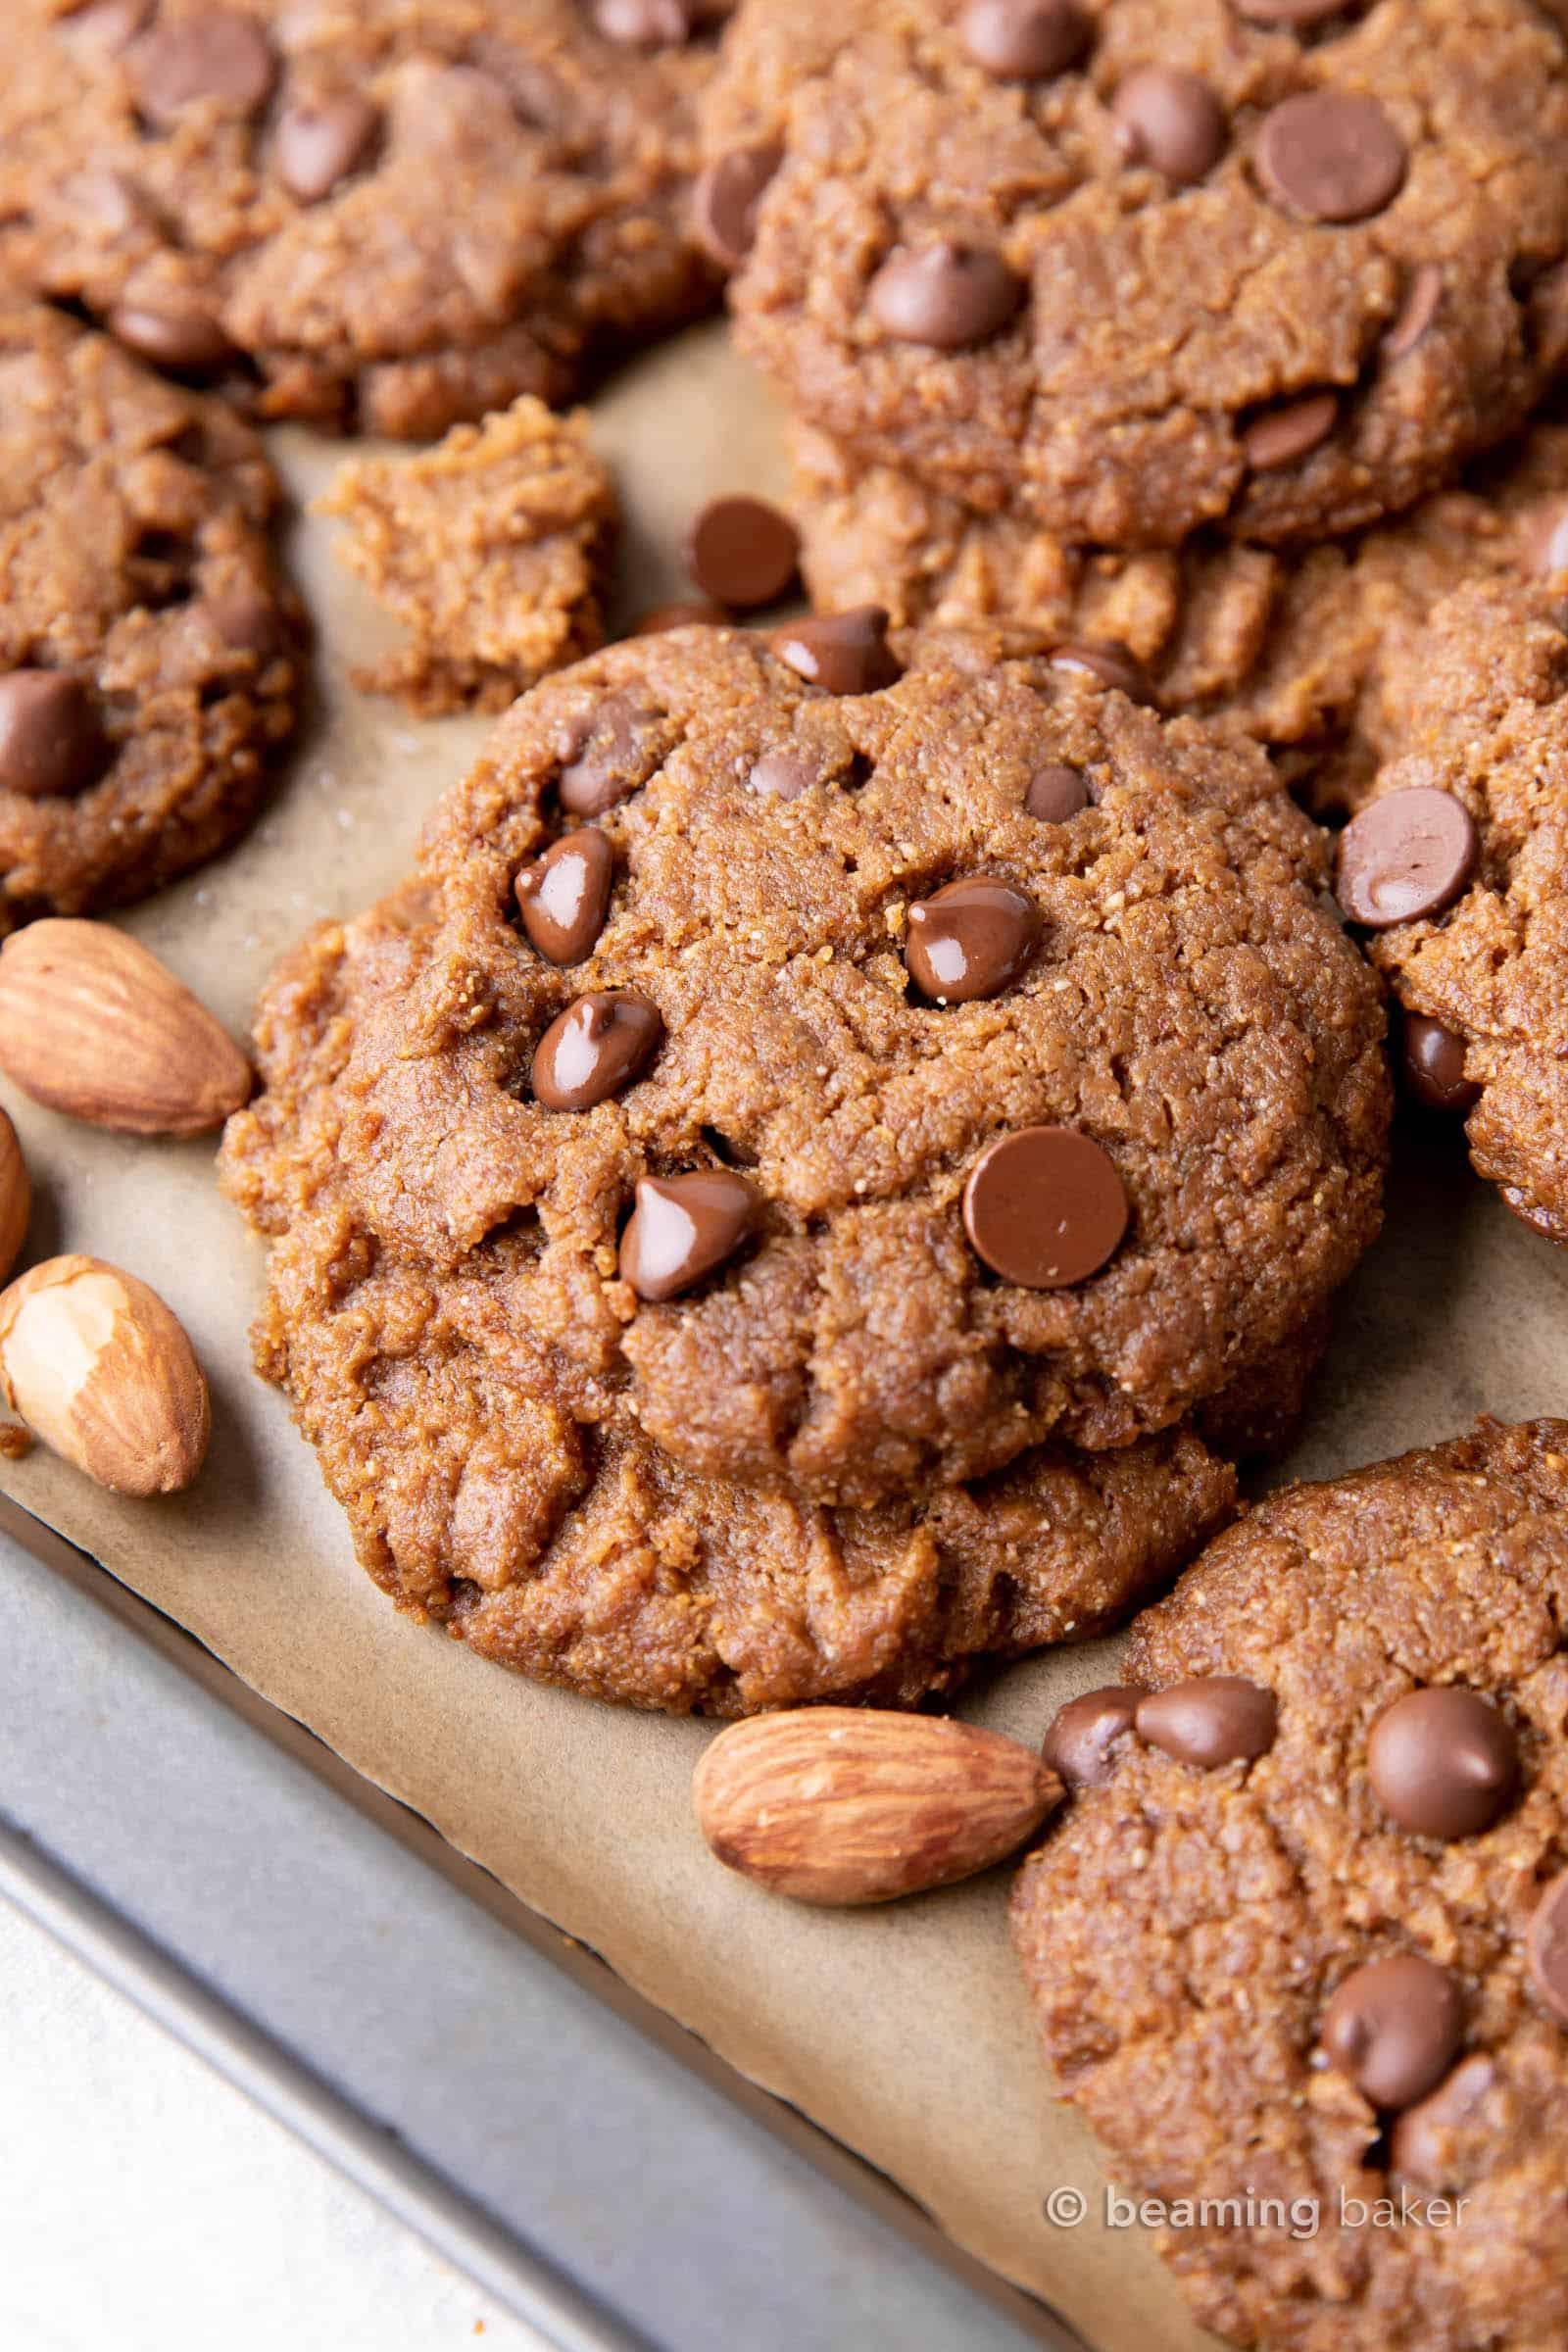 4 Ingredient Flourless Almond Butter Cookies (Gluten Free): unbelievably soft 'n chewy flourless almond butter cookies made with just 4 ingredients! The best gluten free almond butter cookies—easy to make, delicious, simple ingredients. #Flourless #GlutenFree #Cookies #AlmondButter | Recipe at BeamingBaker.com